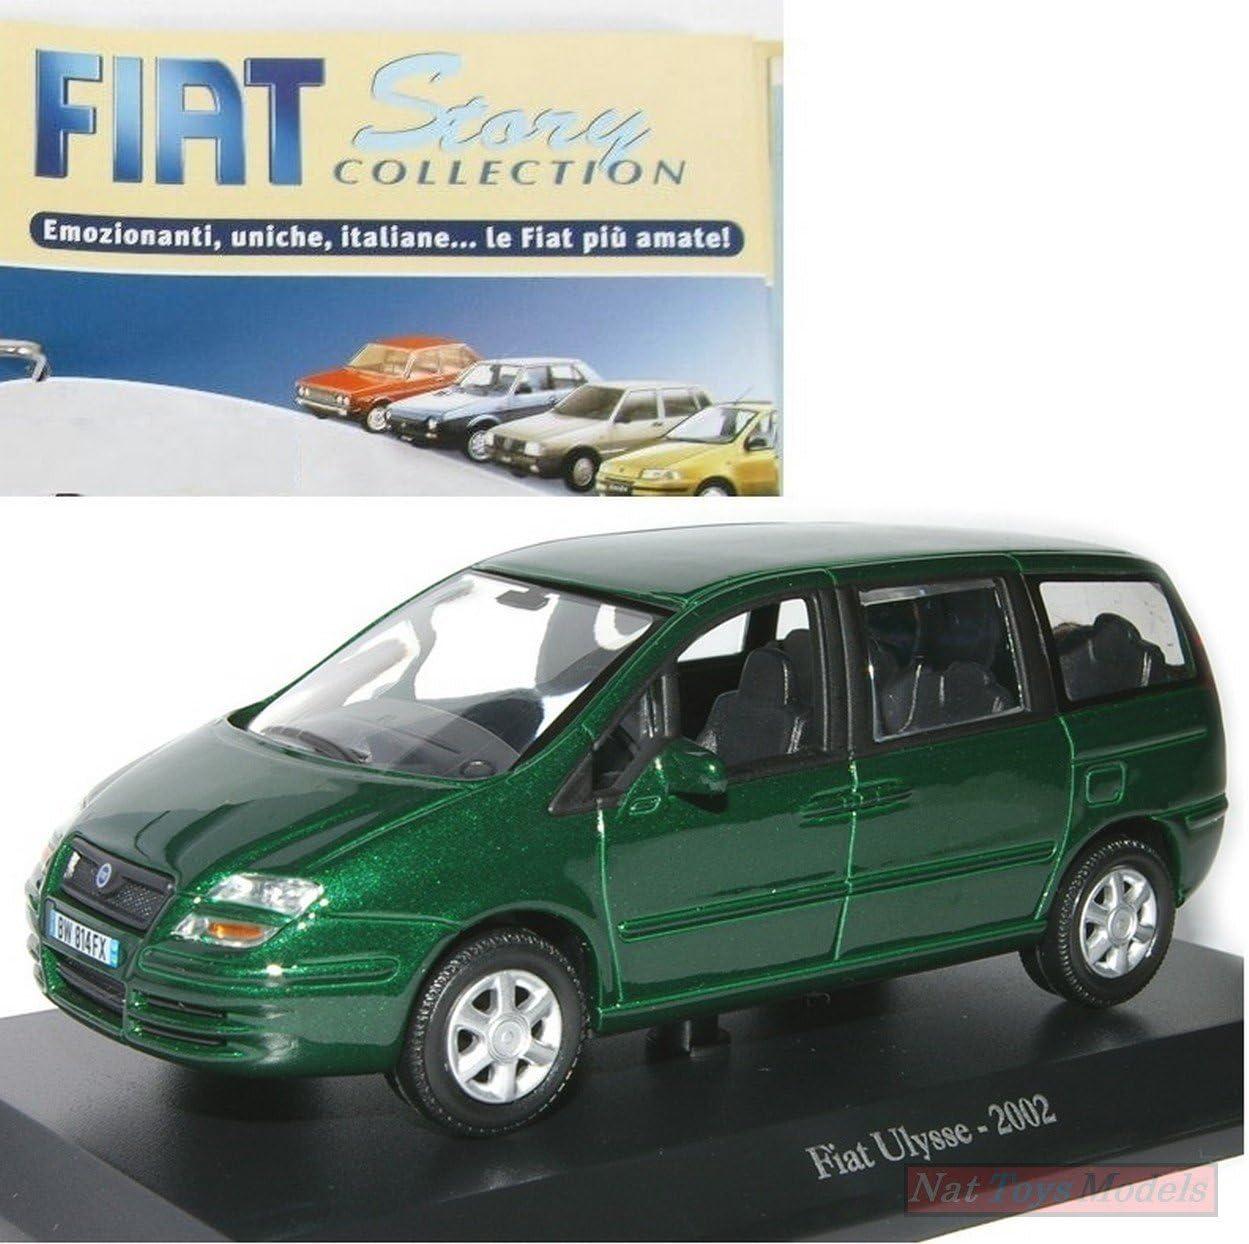 EDICOLA Fiat Ulysse 2002 MODELLINO Die Cast 1:43 Norev Model +fas ...